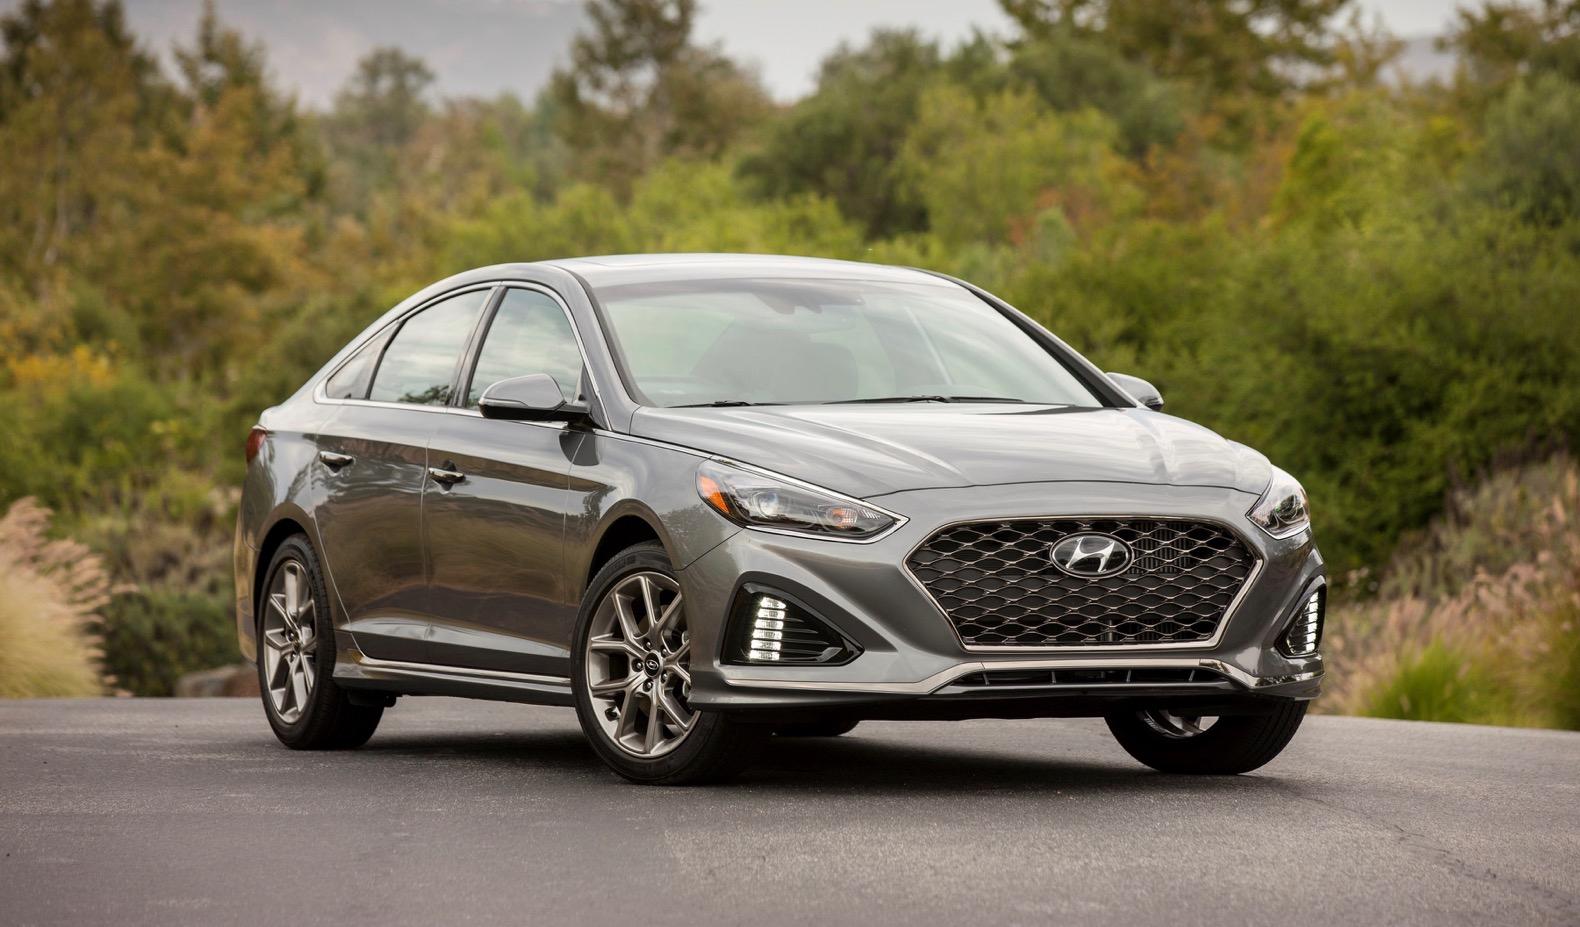 2022 Hyundai Sonata Hybrid Spesification